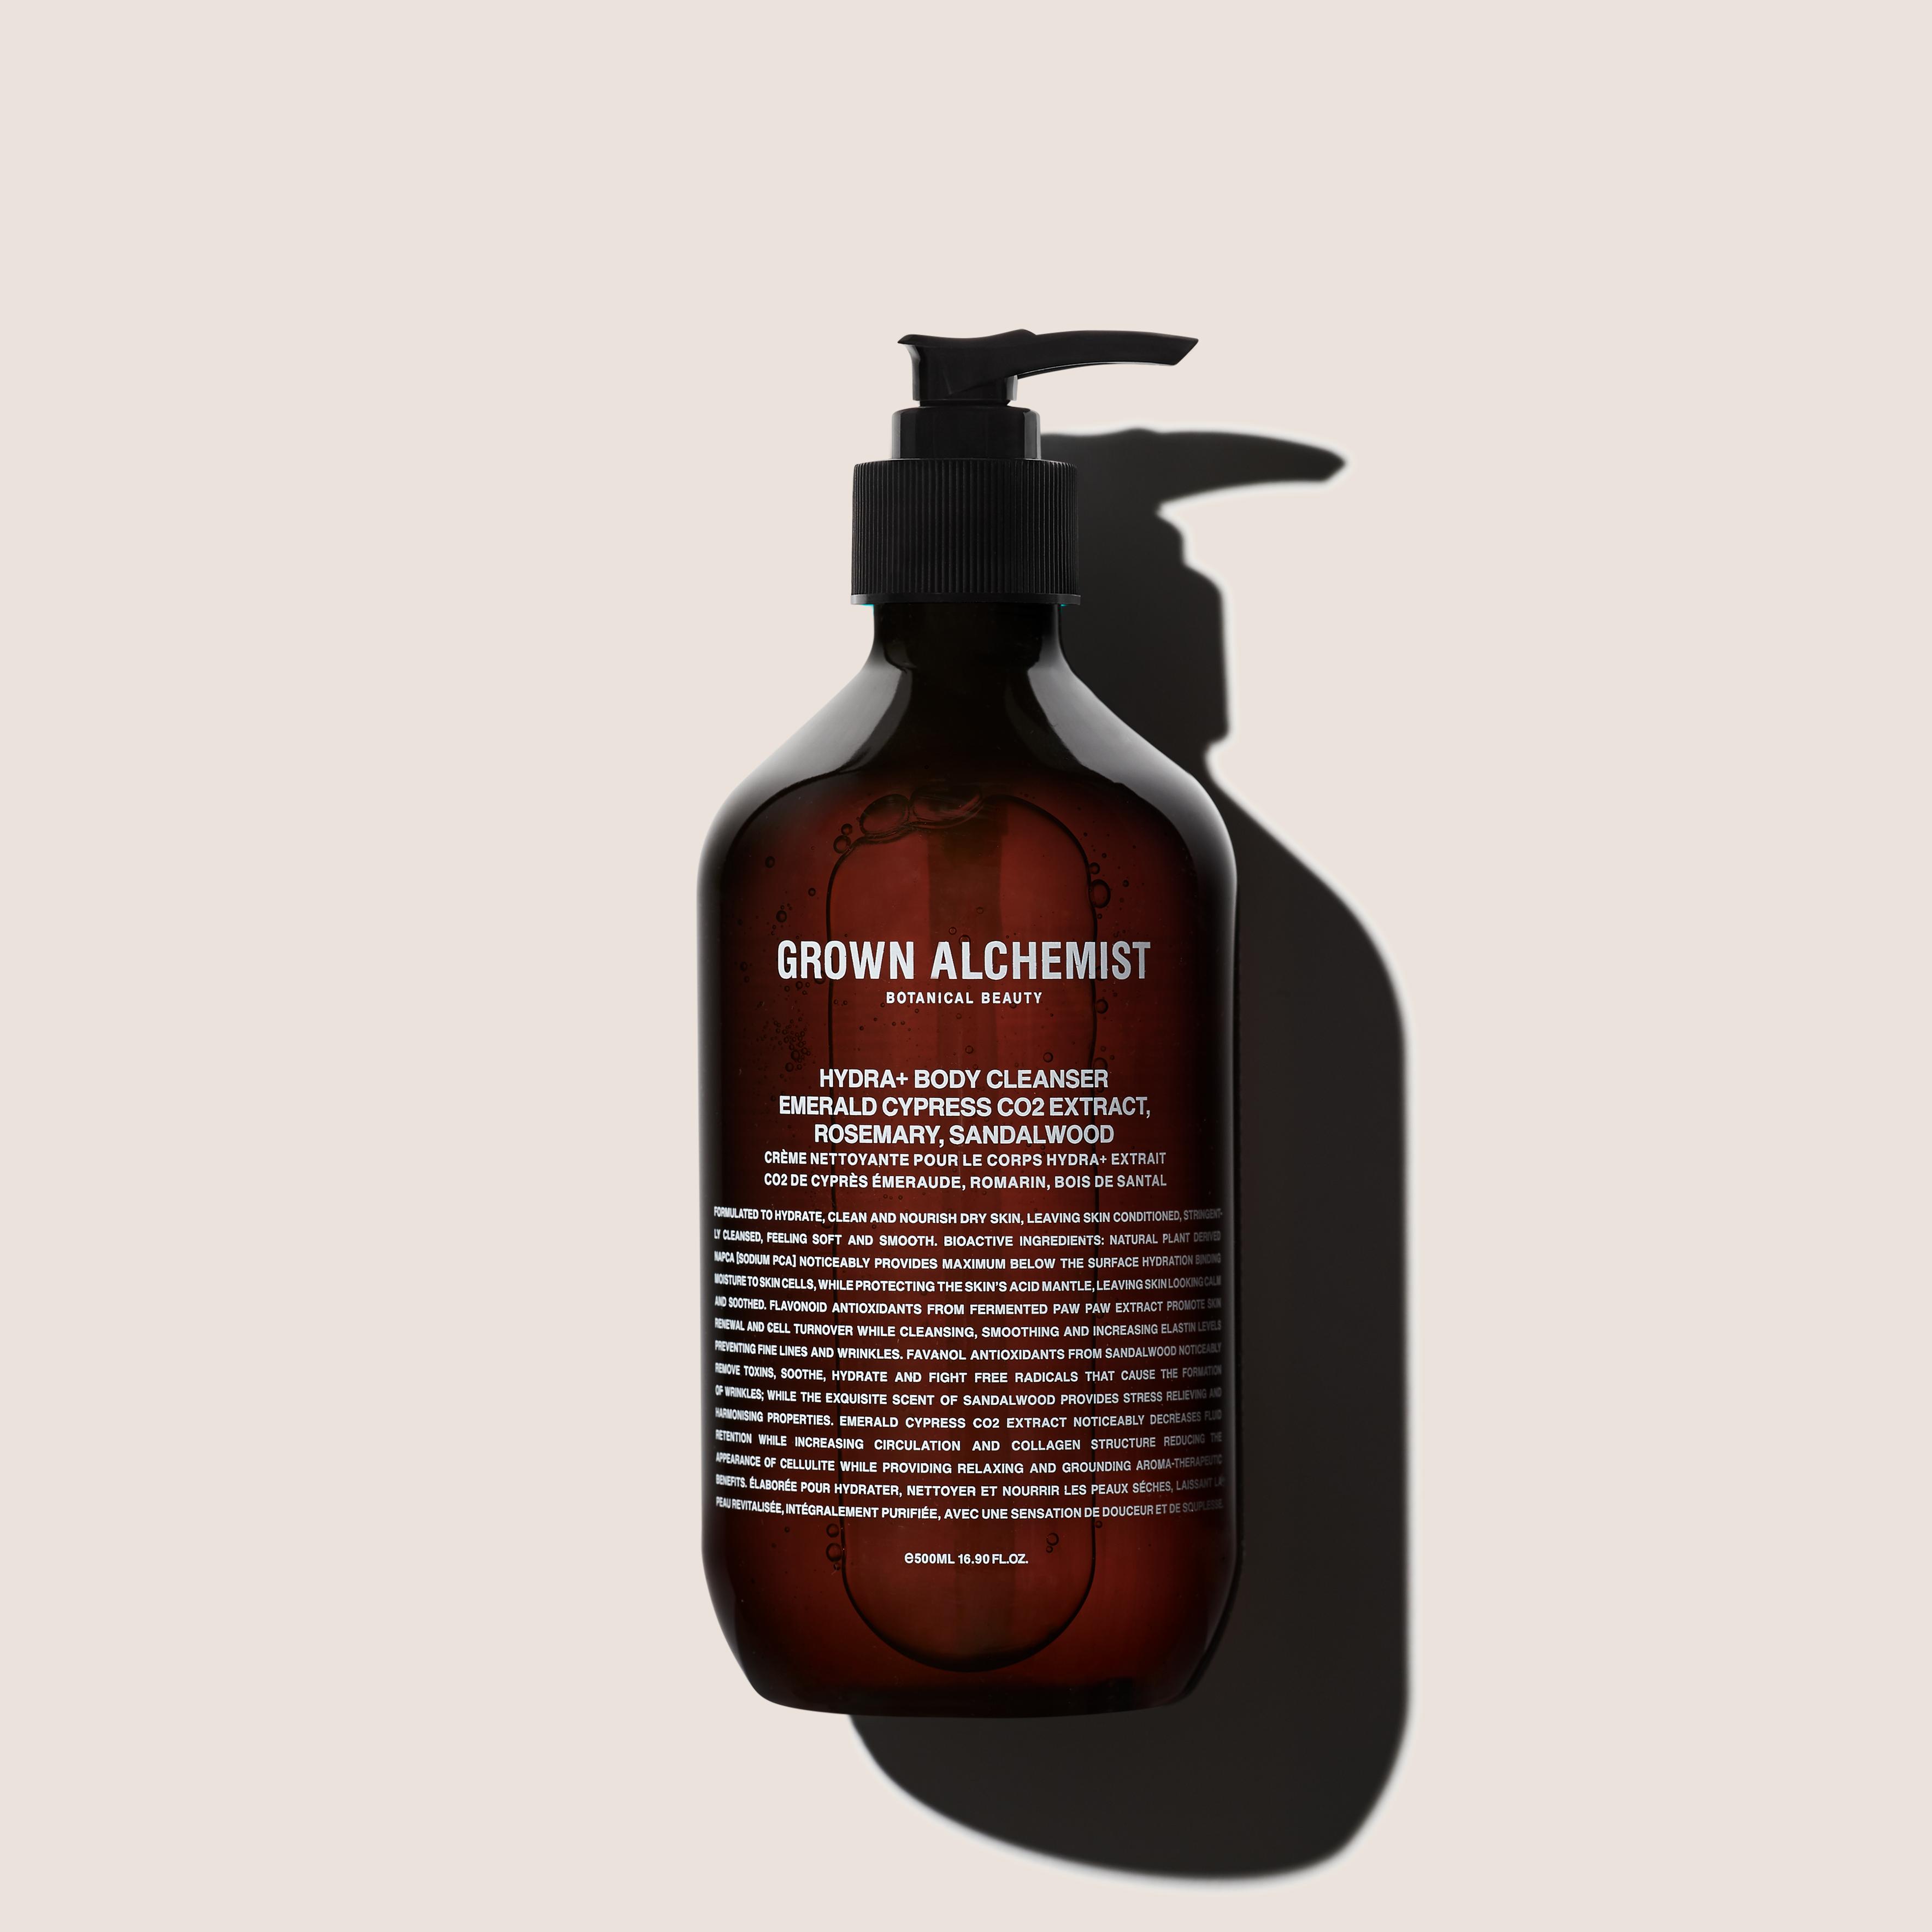 Hydra+ Body Cleanser